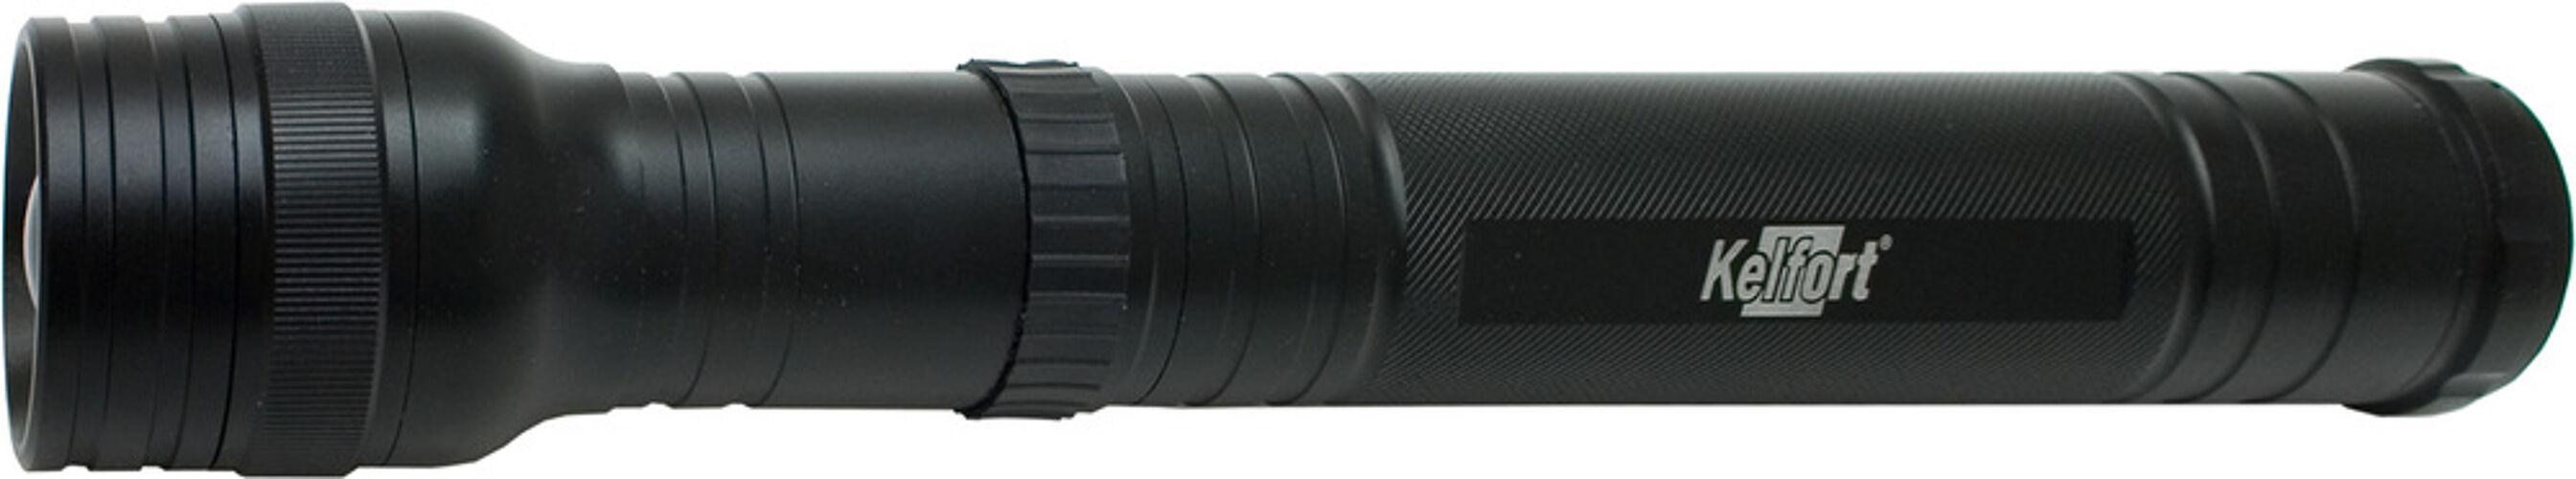 Staaflamp powerled oplaadbaar 5W